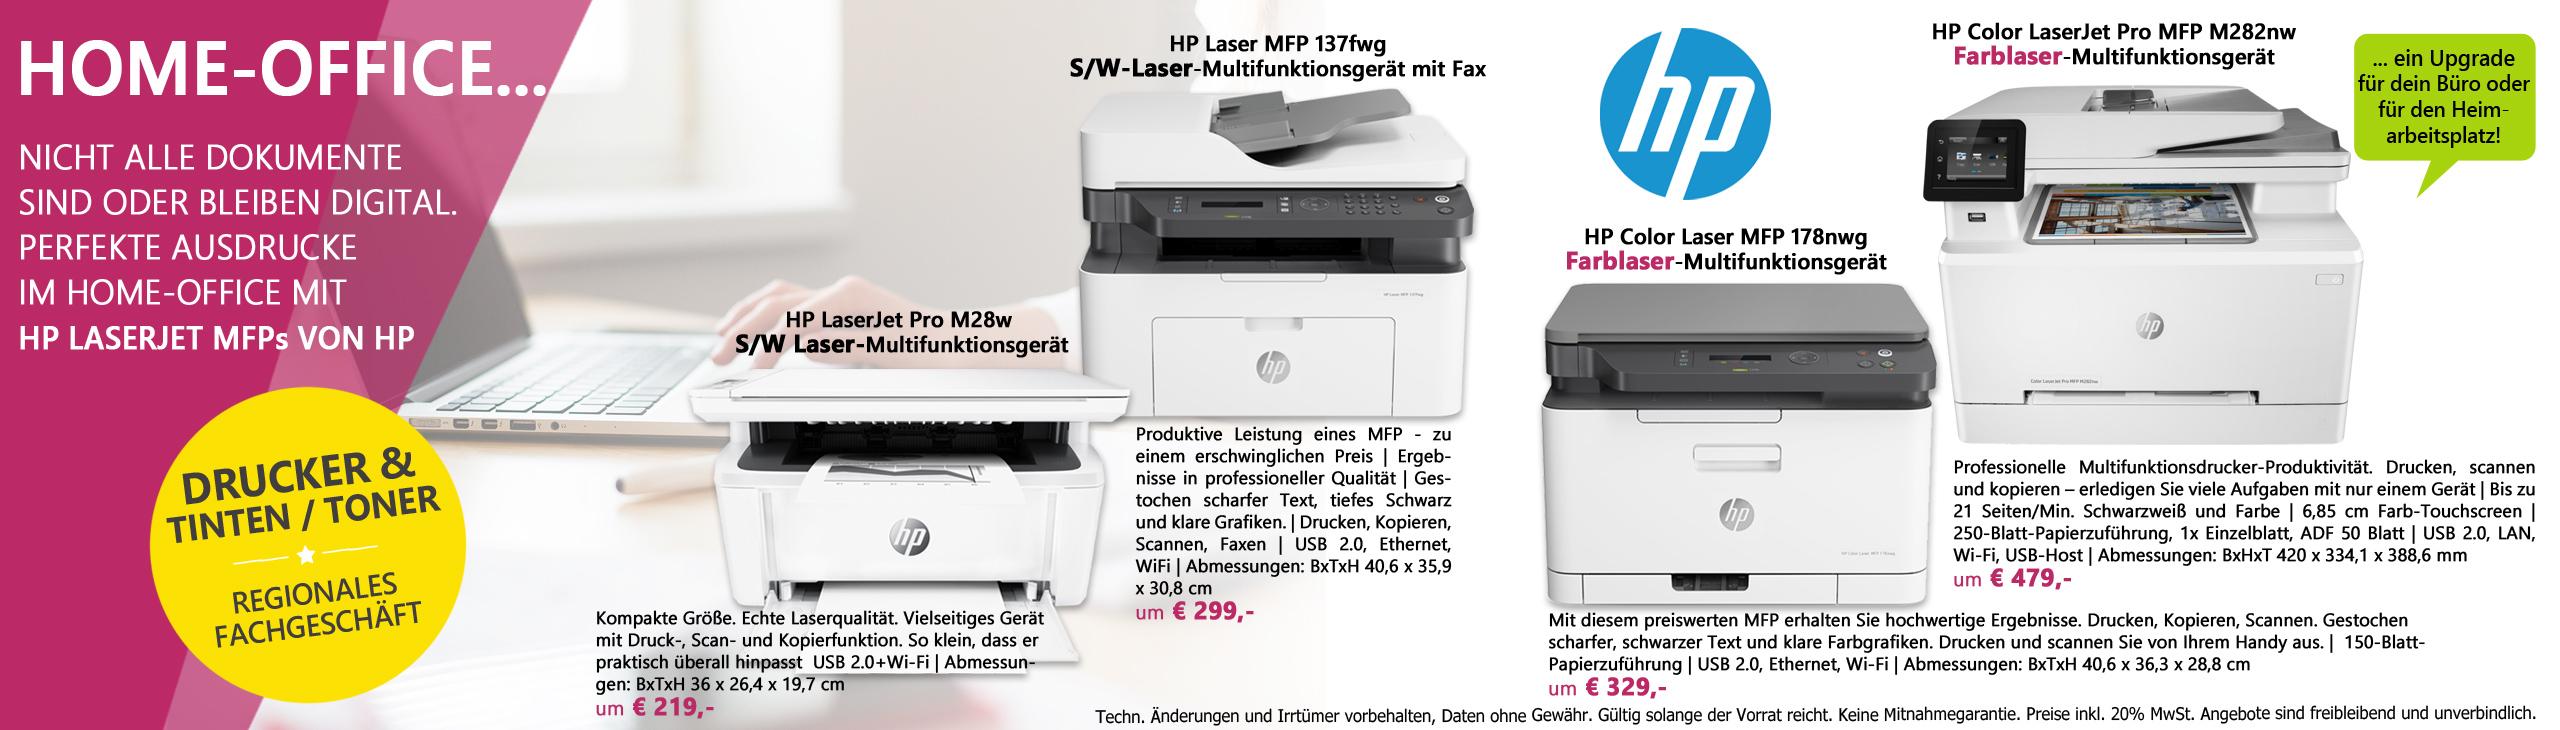 Banner homeoffice hp laserdrucker 11 2020